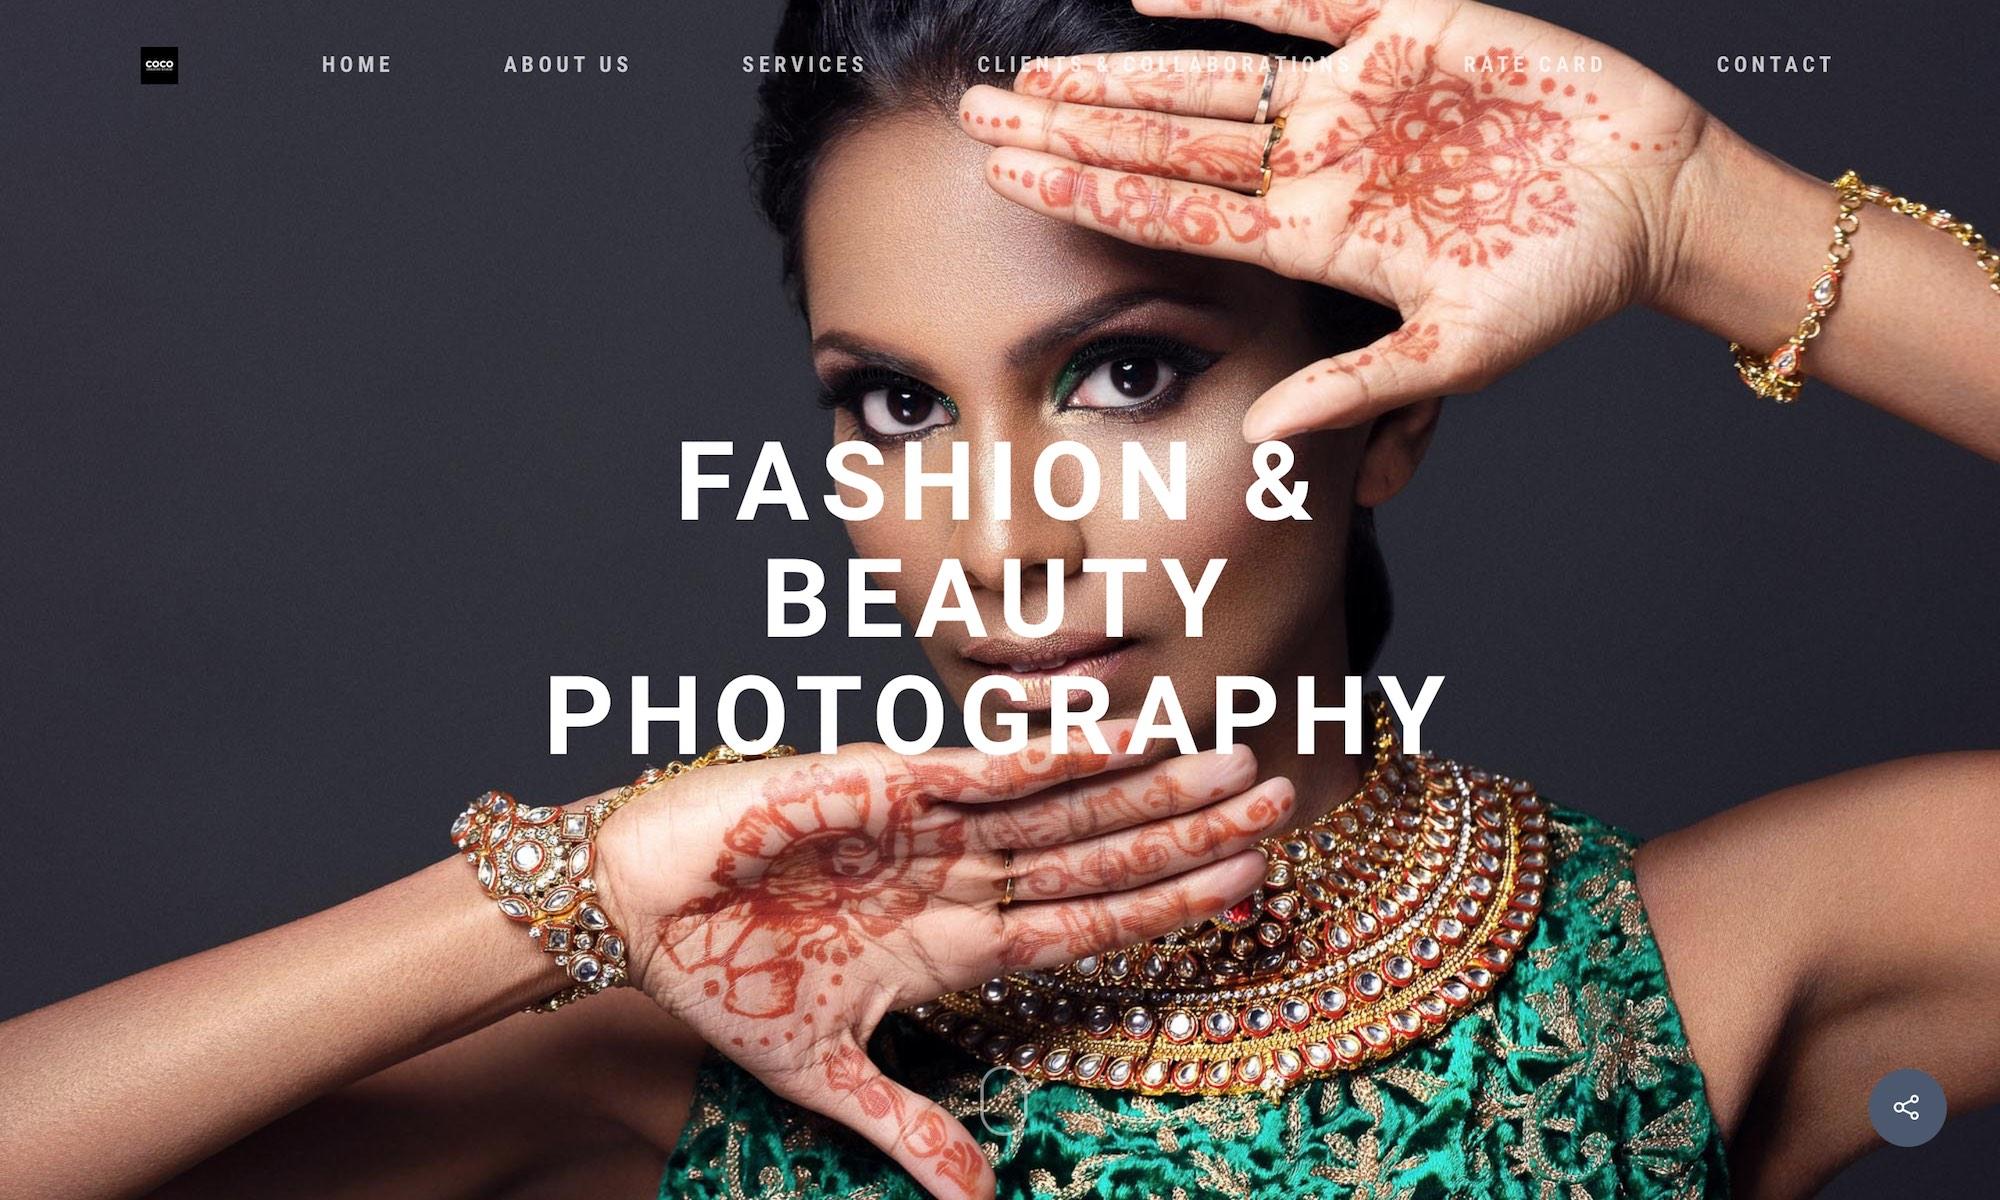 COCO Creative studio photography & videography Singapore - Fashion Beauty